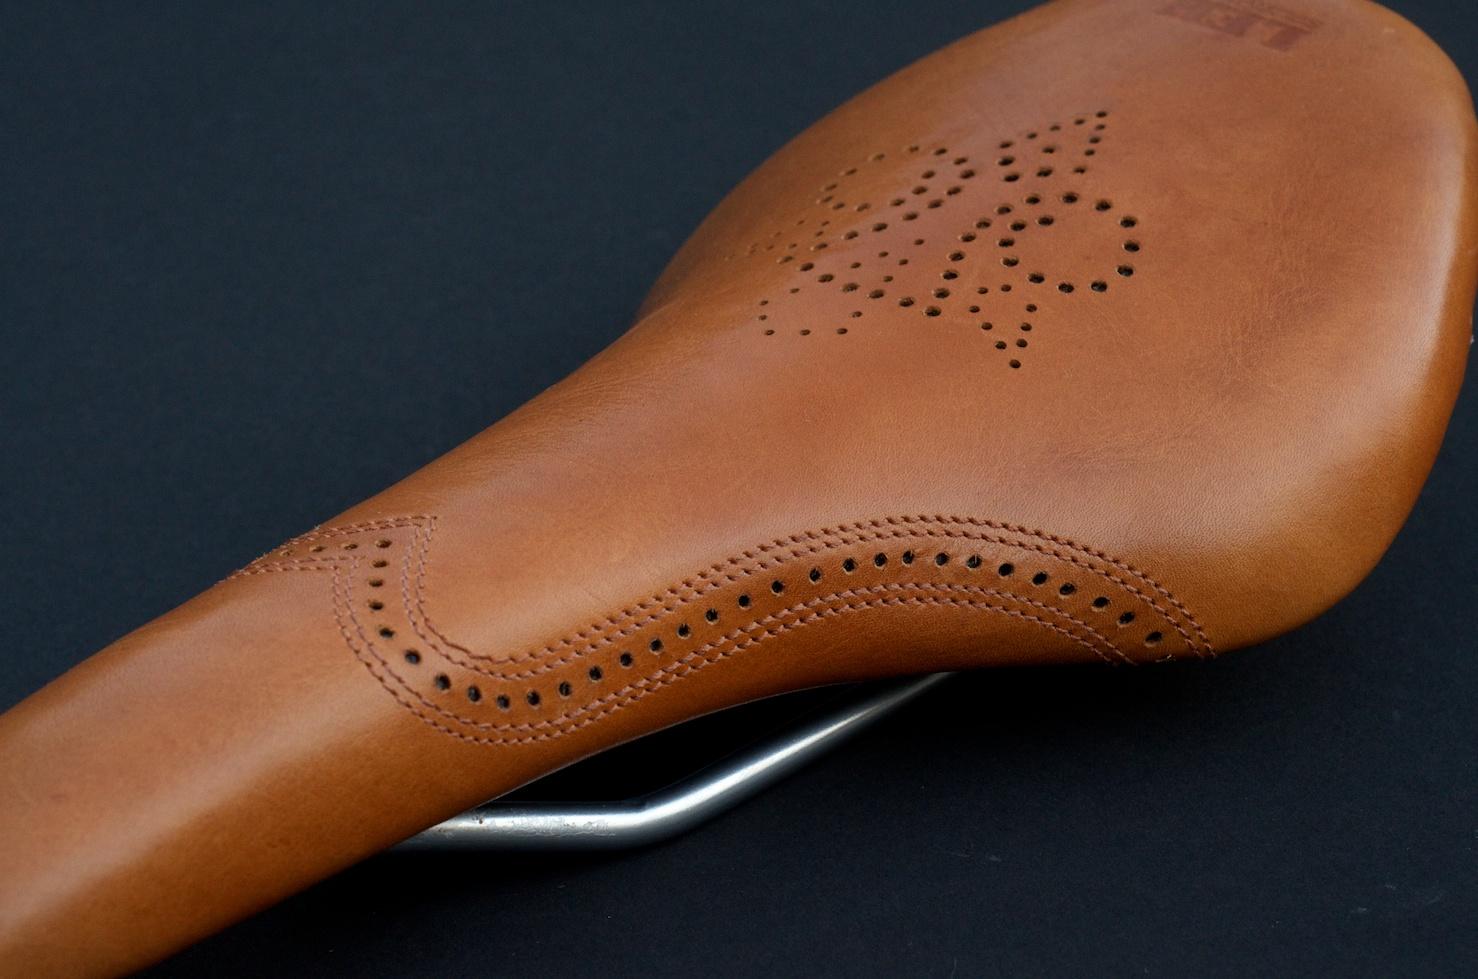 Leh-Seats-carson-leather-bike-seat-custom-oxford-brogue-shoe-saddle-bike-bicycle-brooks-hand-made 1.jpg